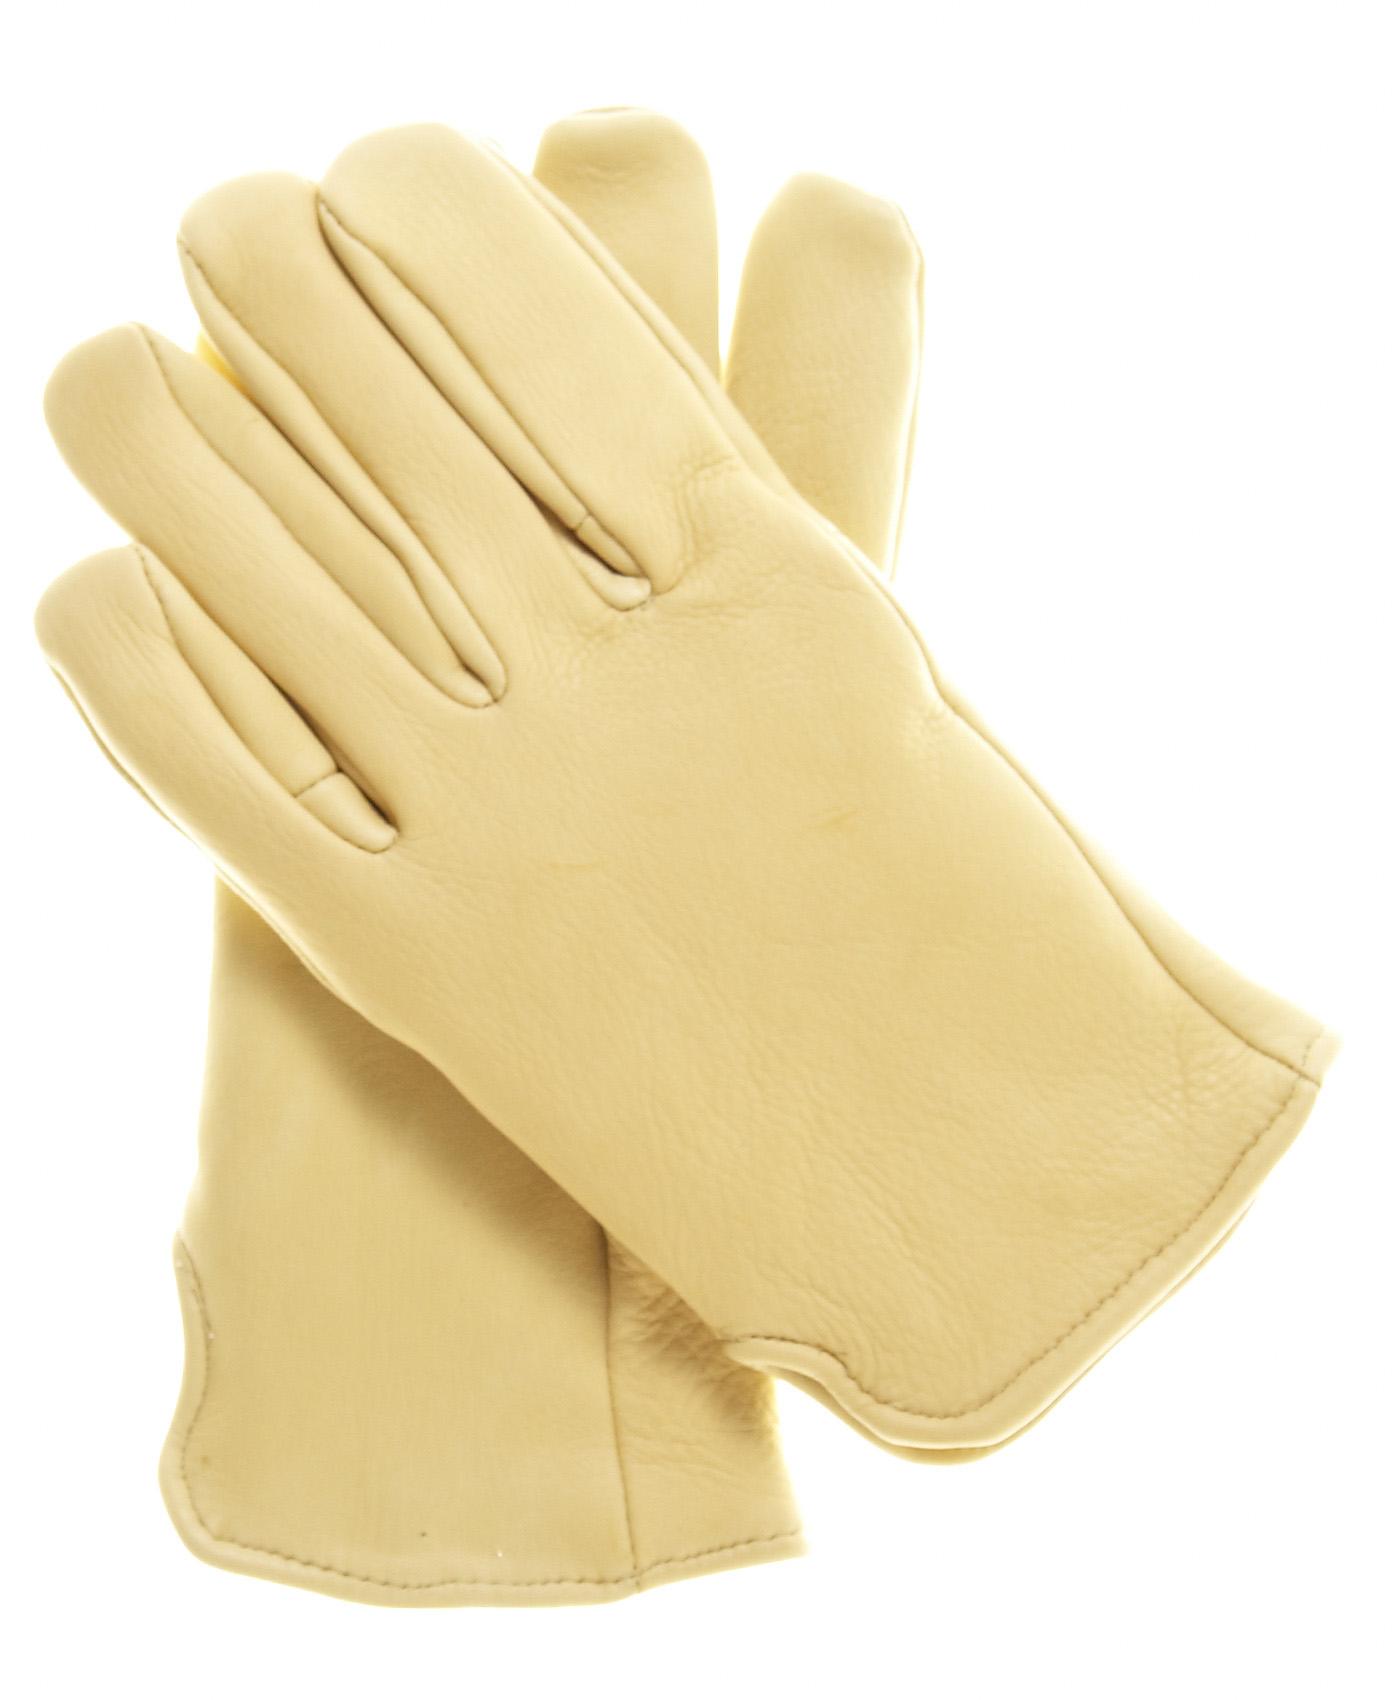 Geier Glove Men's Lined Deerskin Gloves